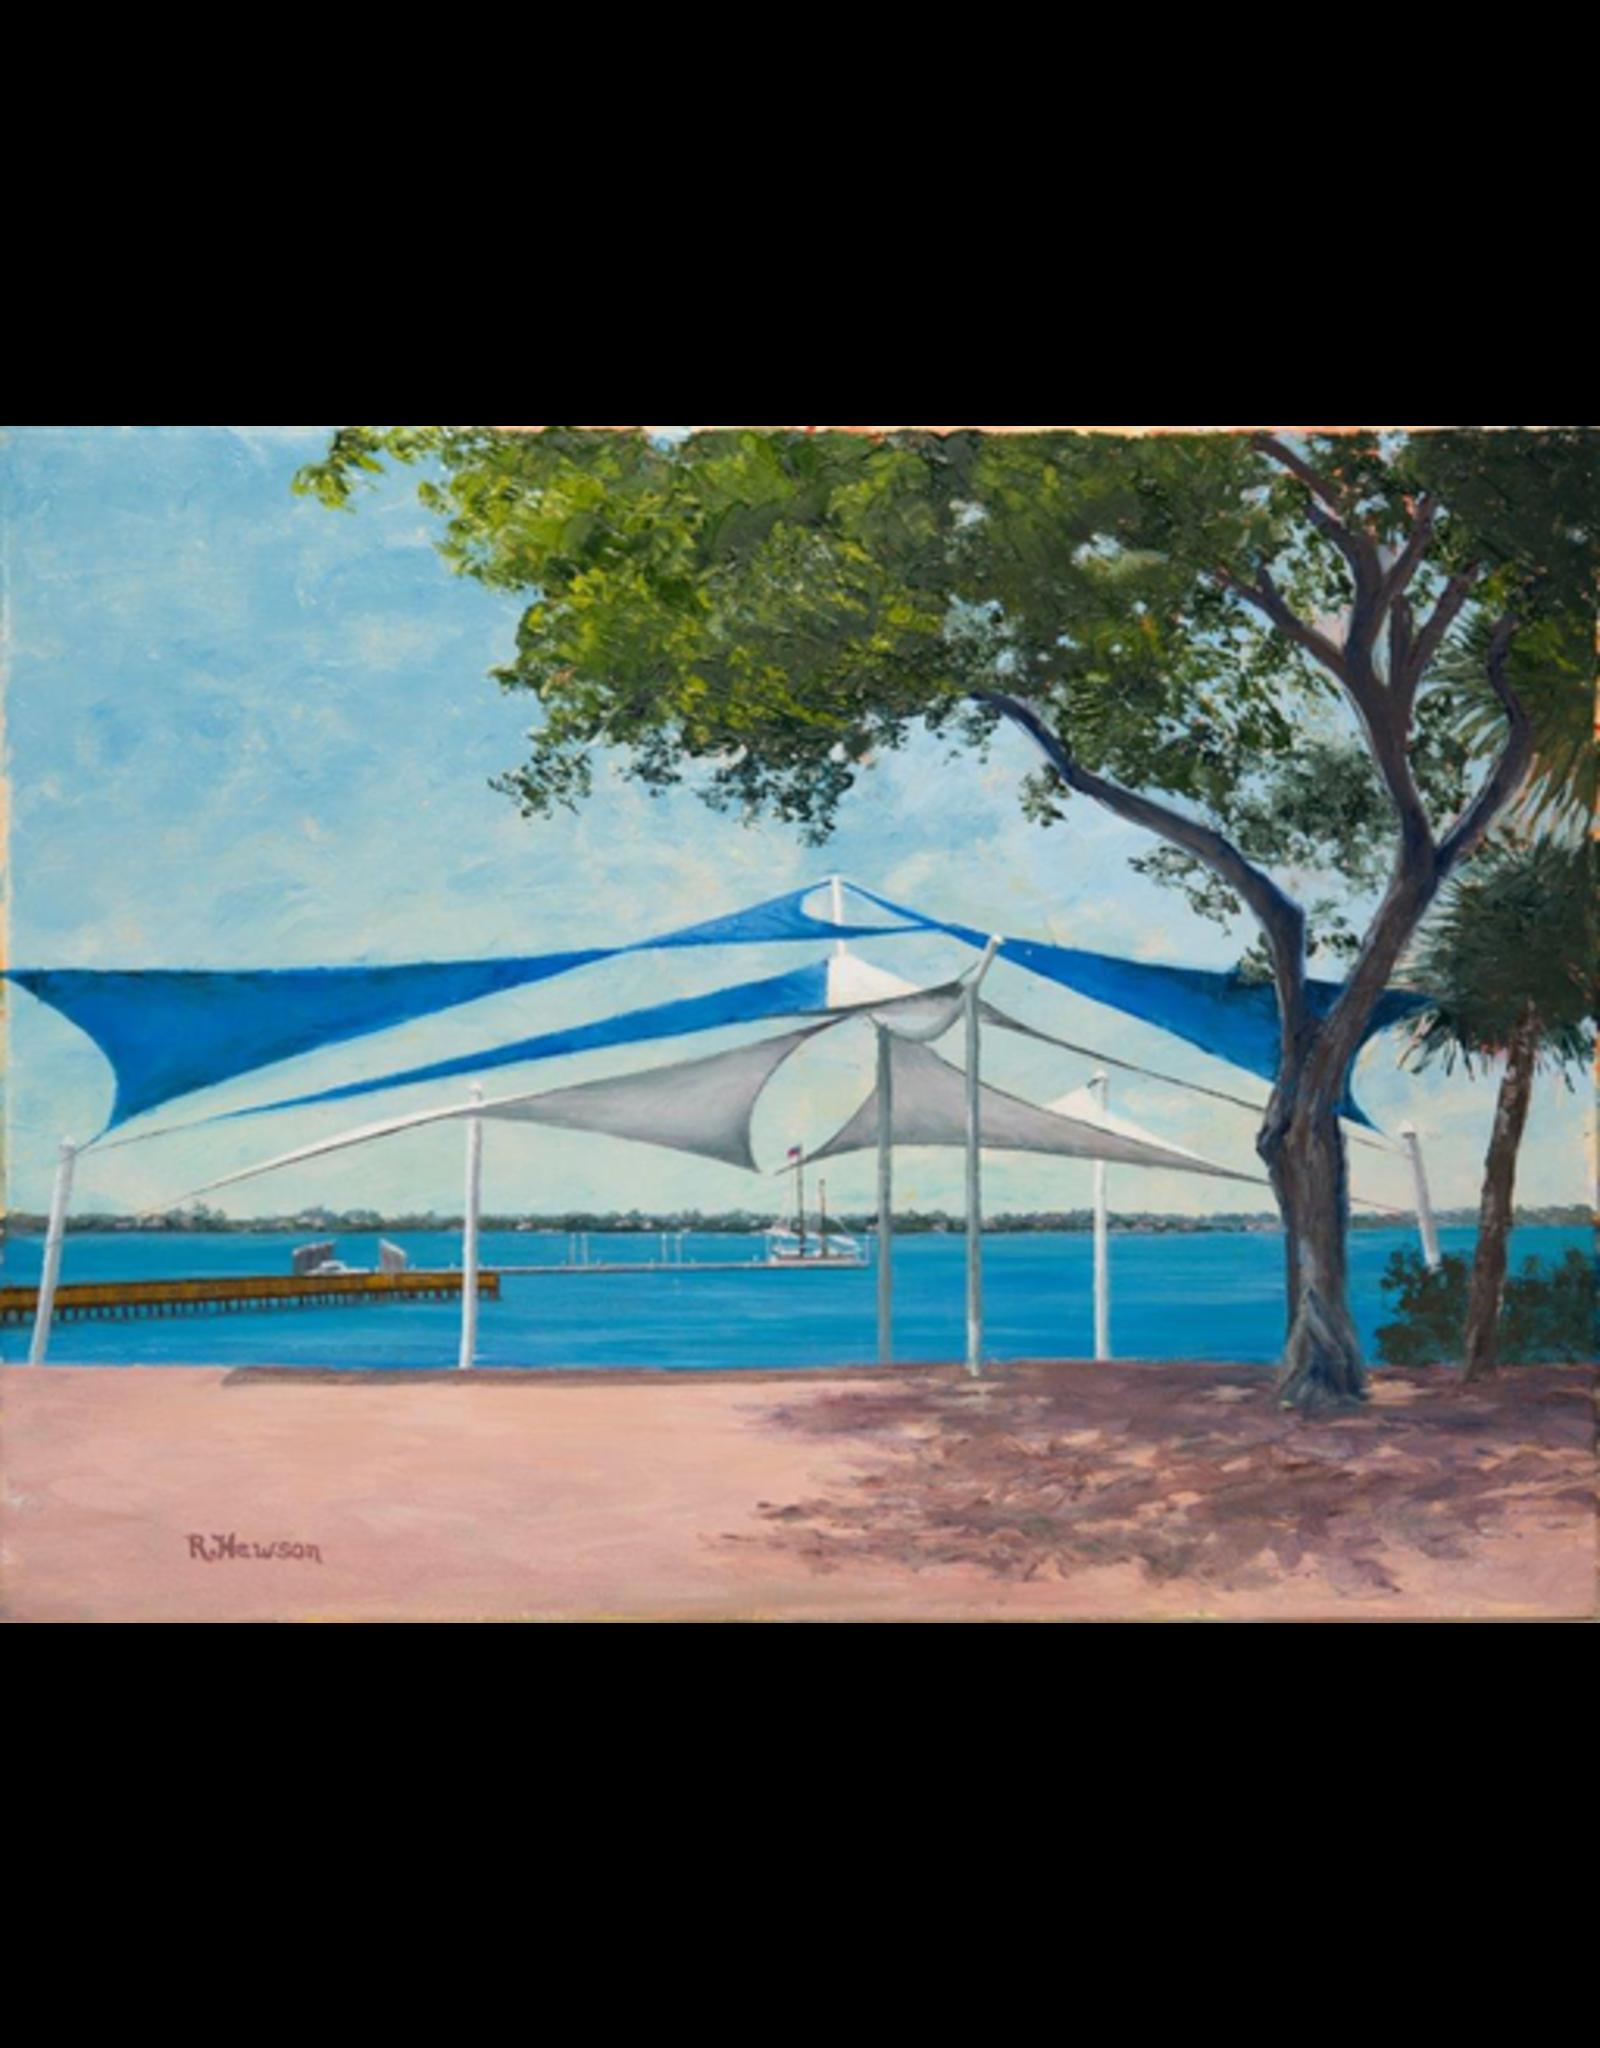 Ruthann Hewson Sails at Riverwalk Stage (Original Oil, Framed, 18x24)